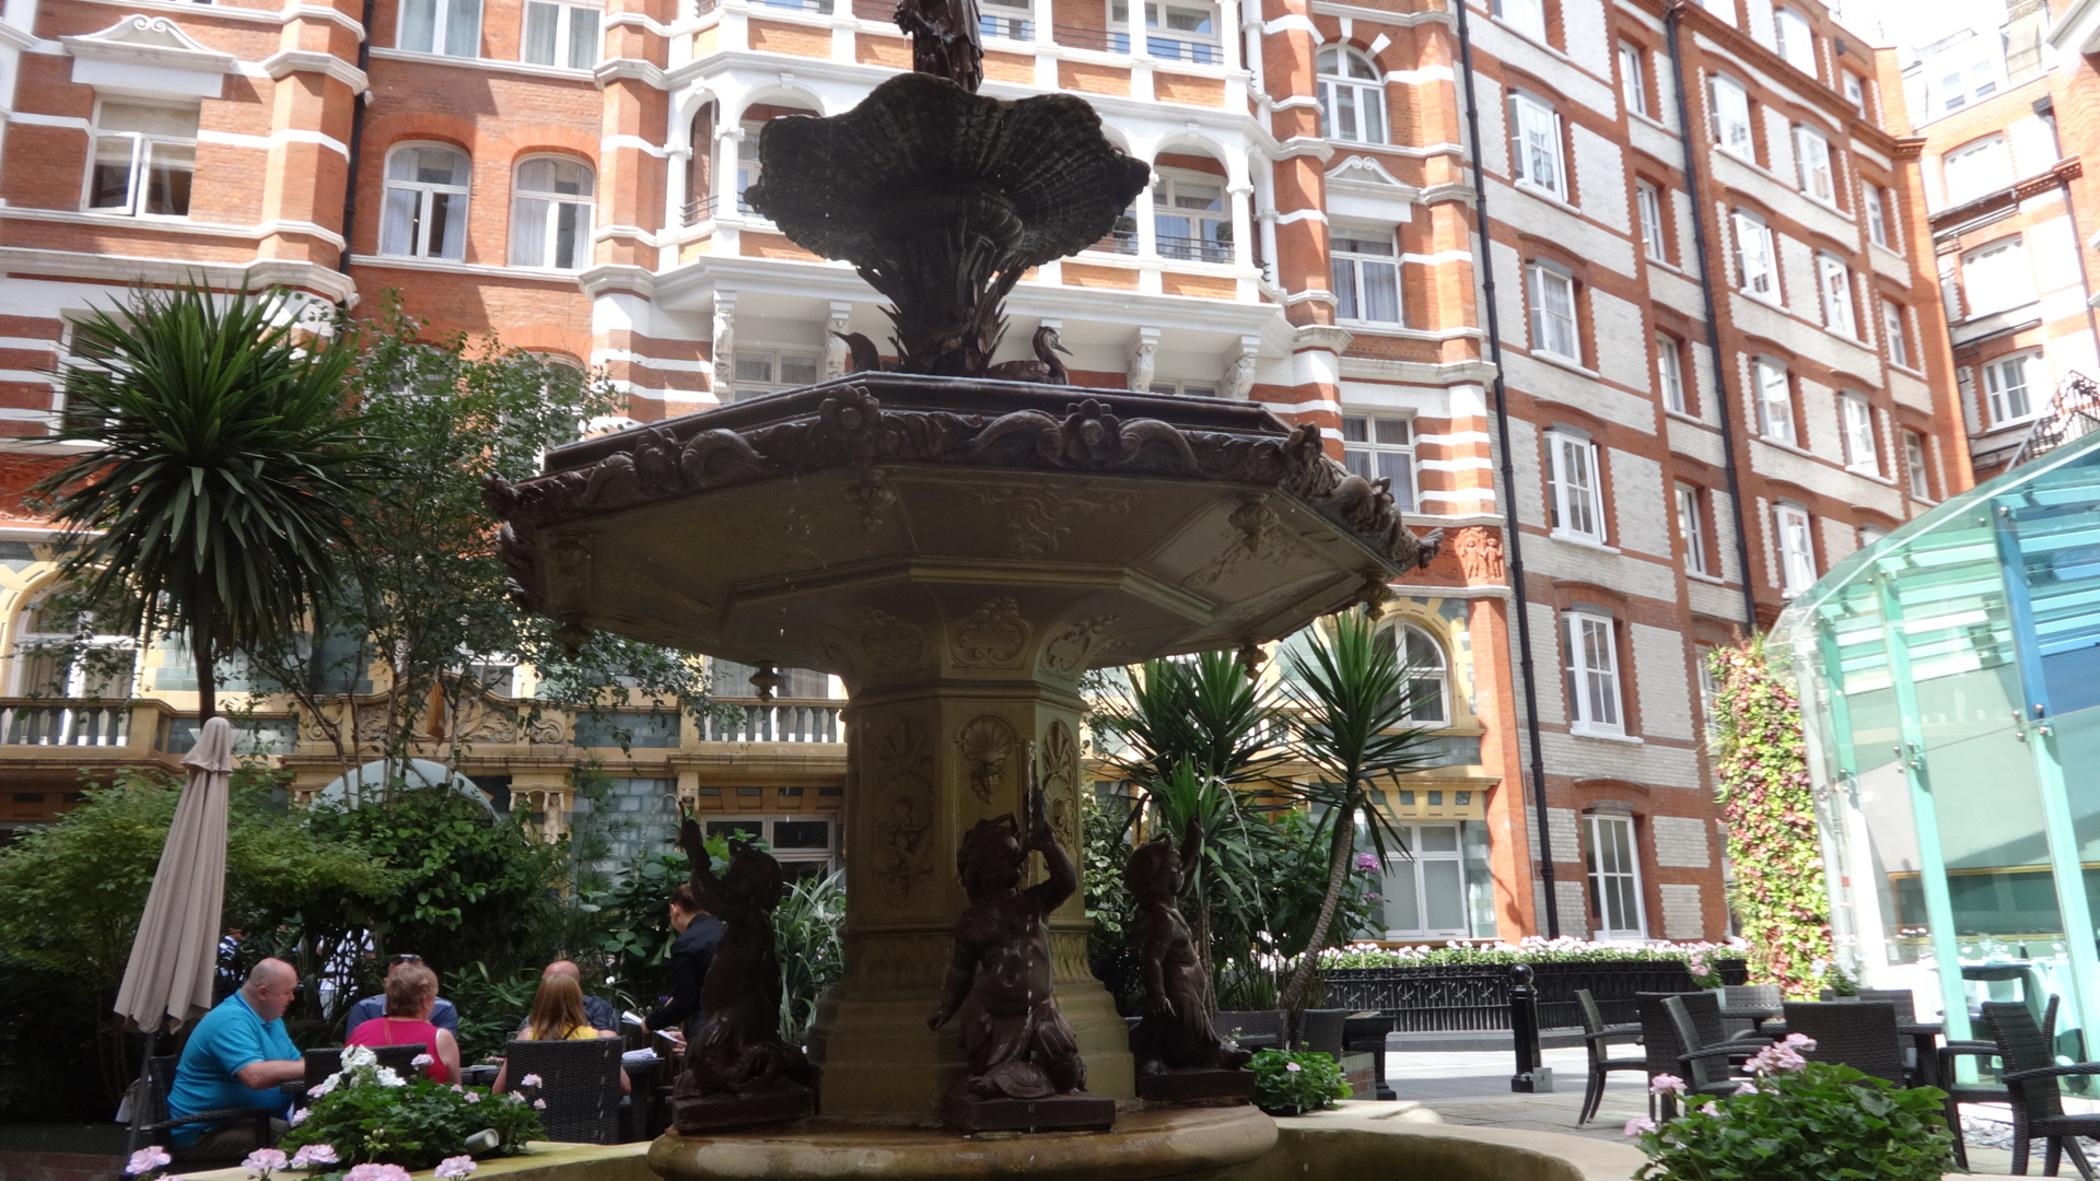 St. James' Court, A Taj Hotel, London